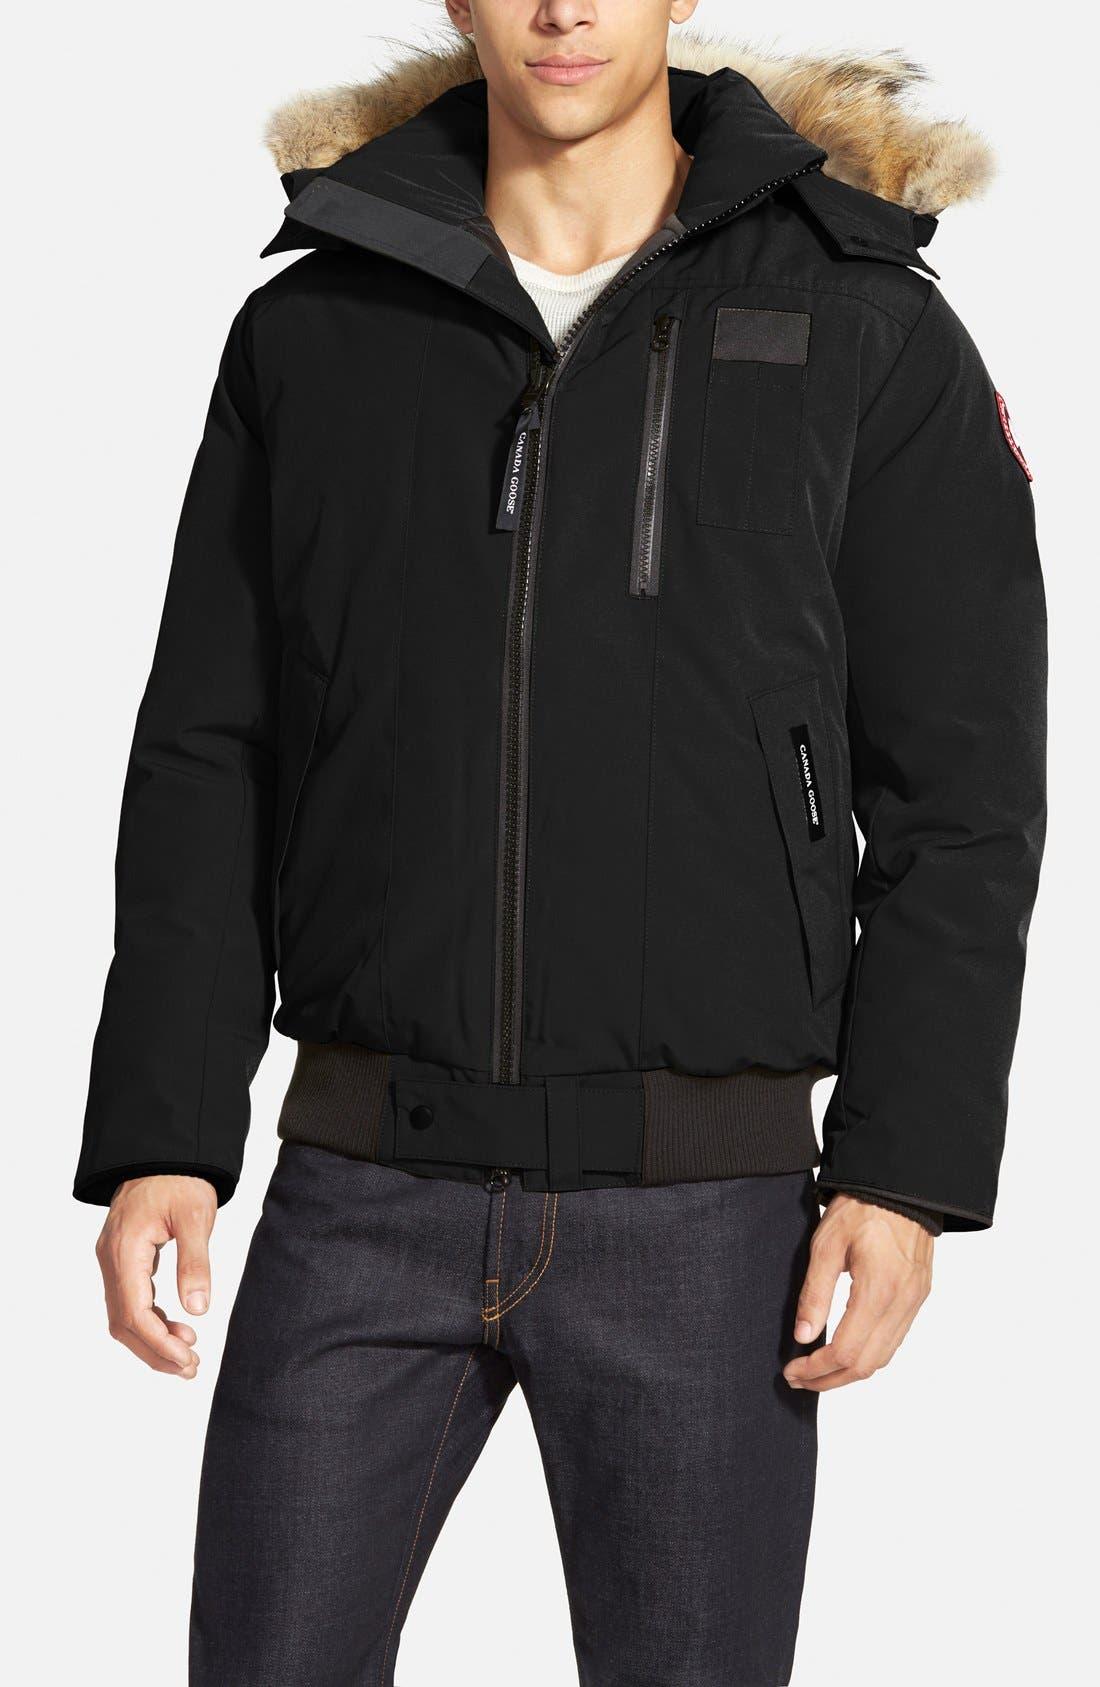 'Borden' Regular Fit Bomber Jacket with Genuine Coyote Trim,                             Main thumbnail 1, color,                             Black